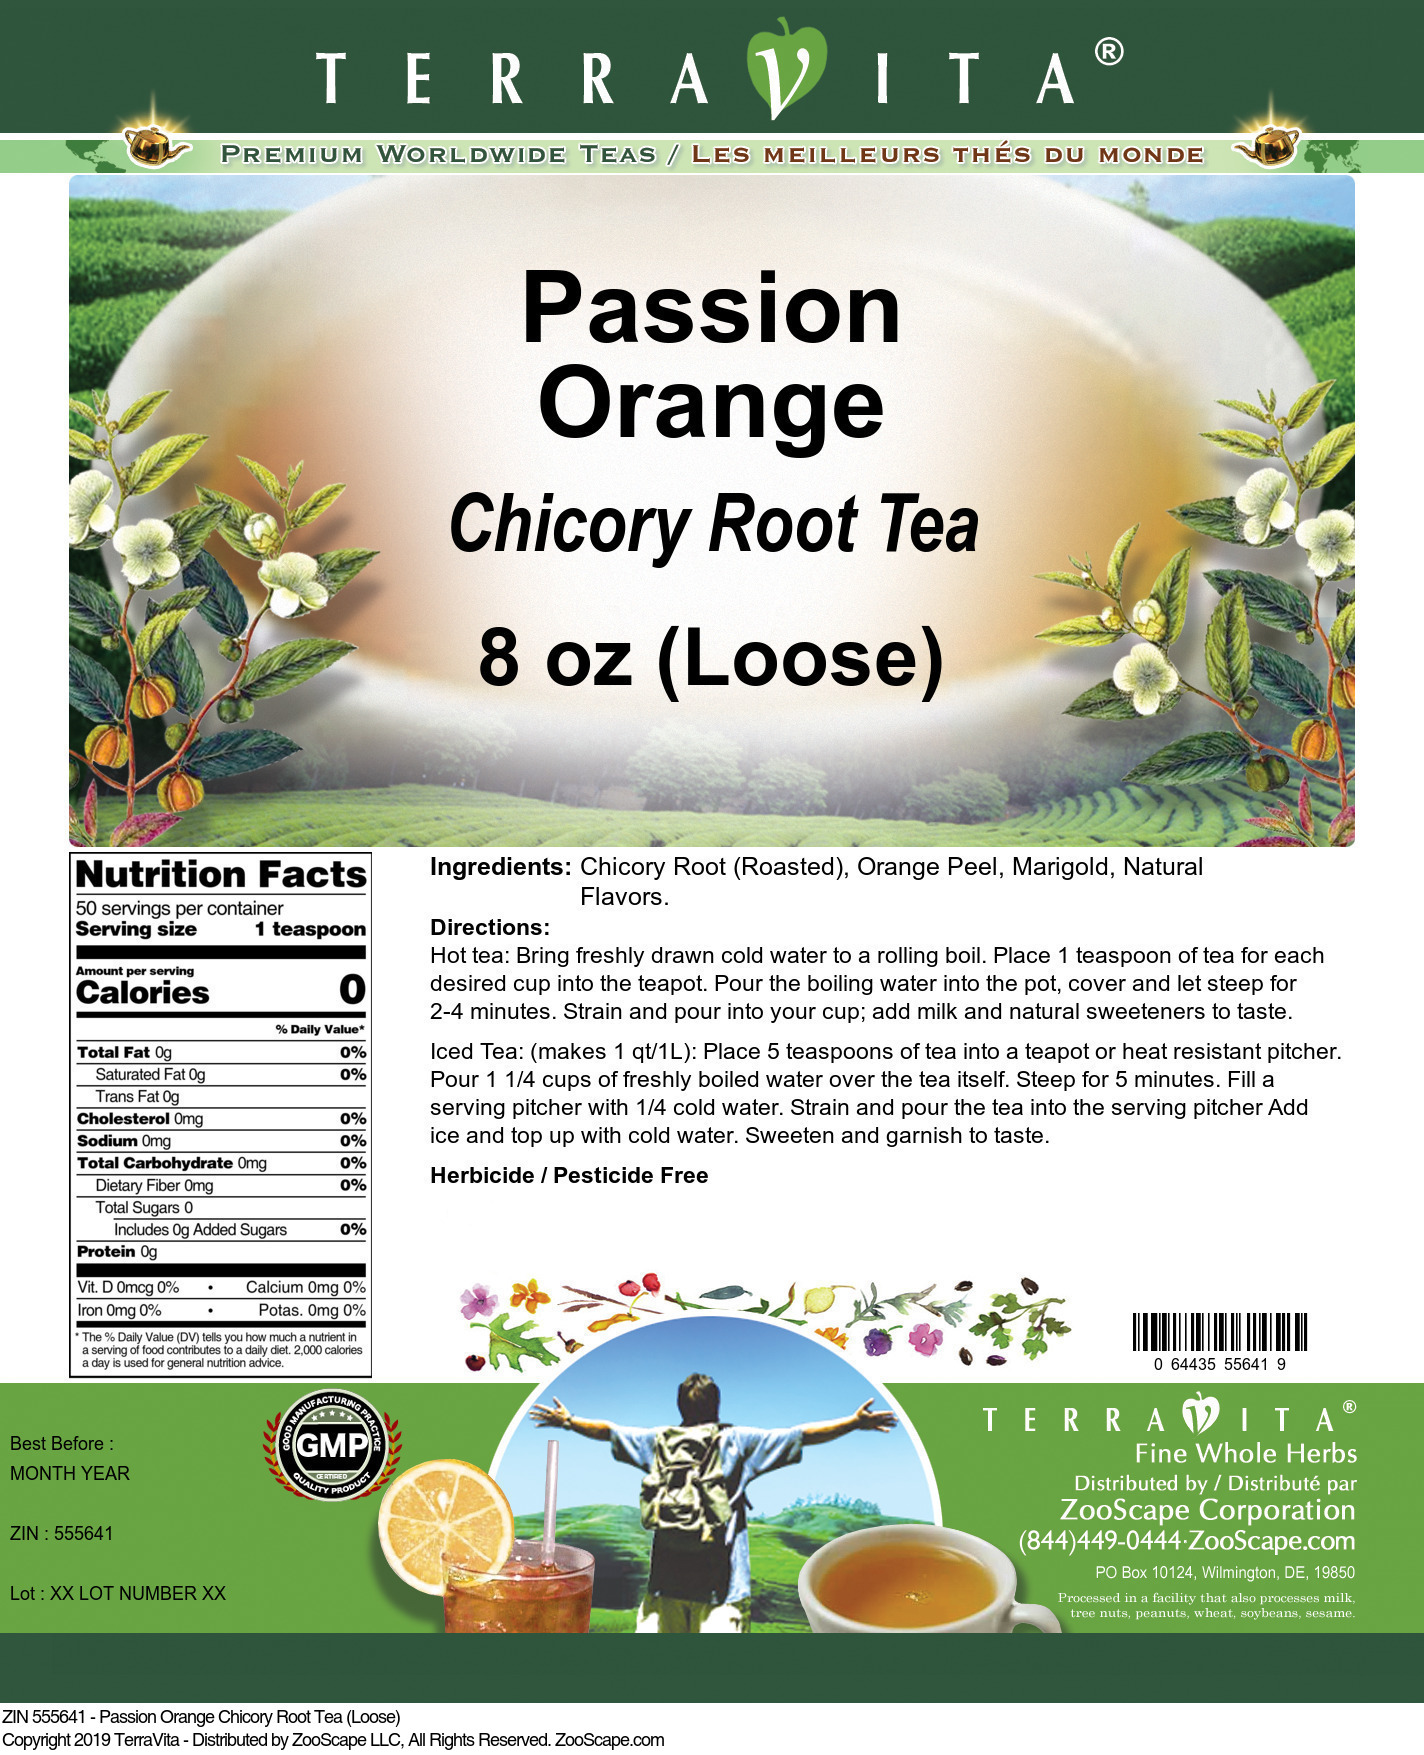 Passion Orange Chicory Root